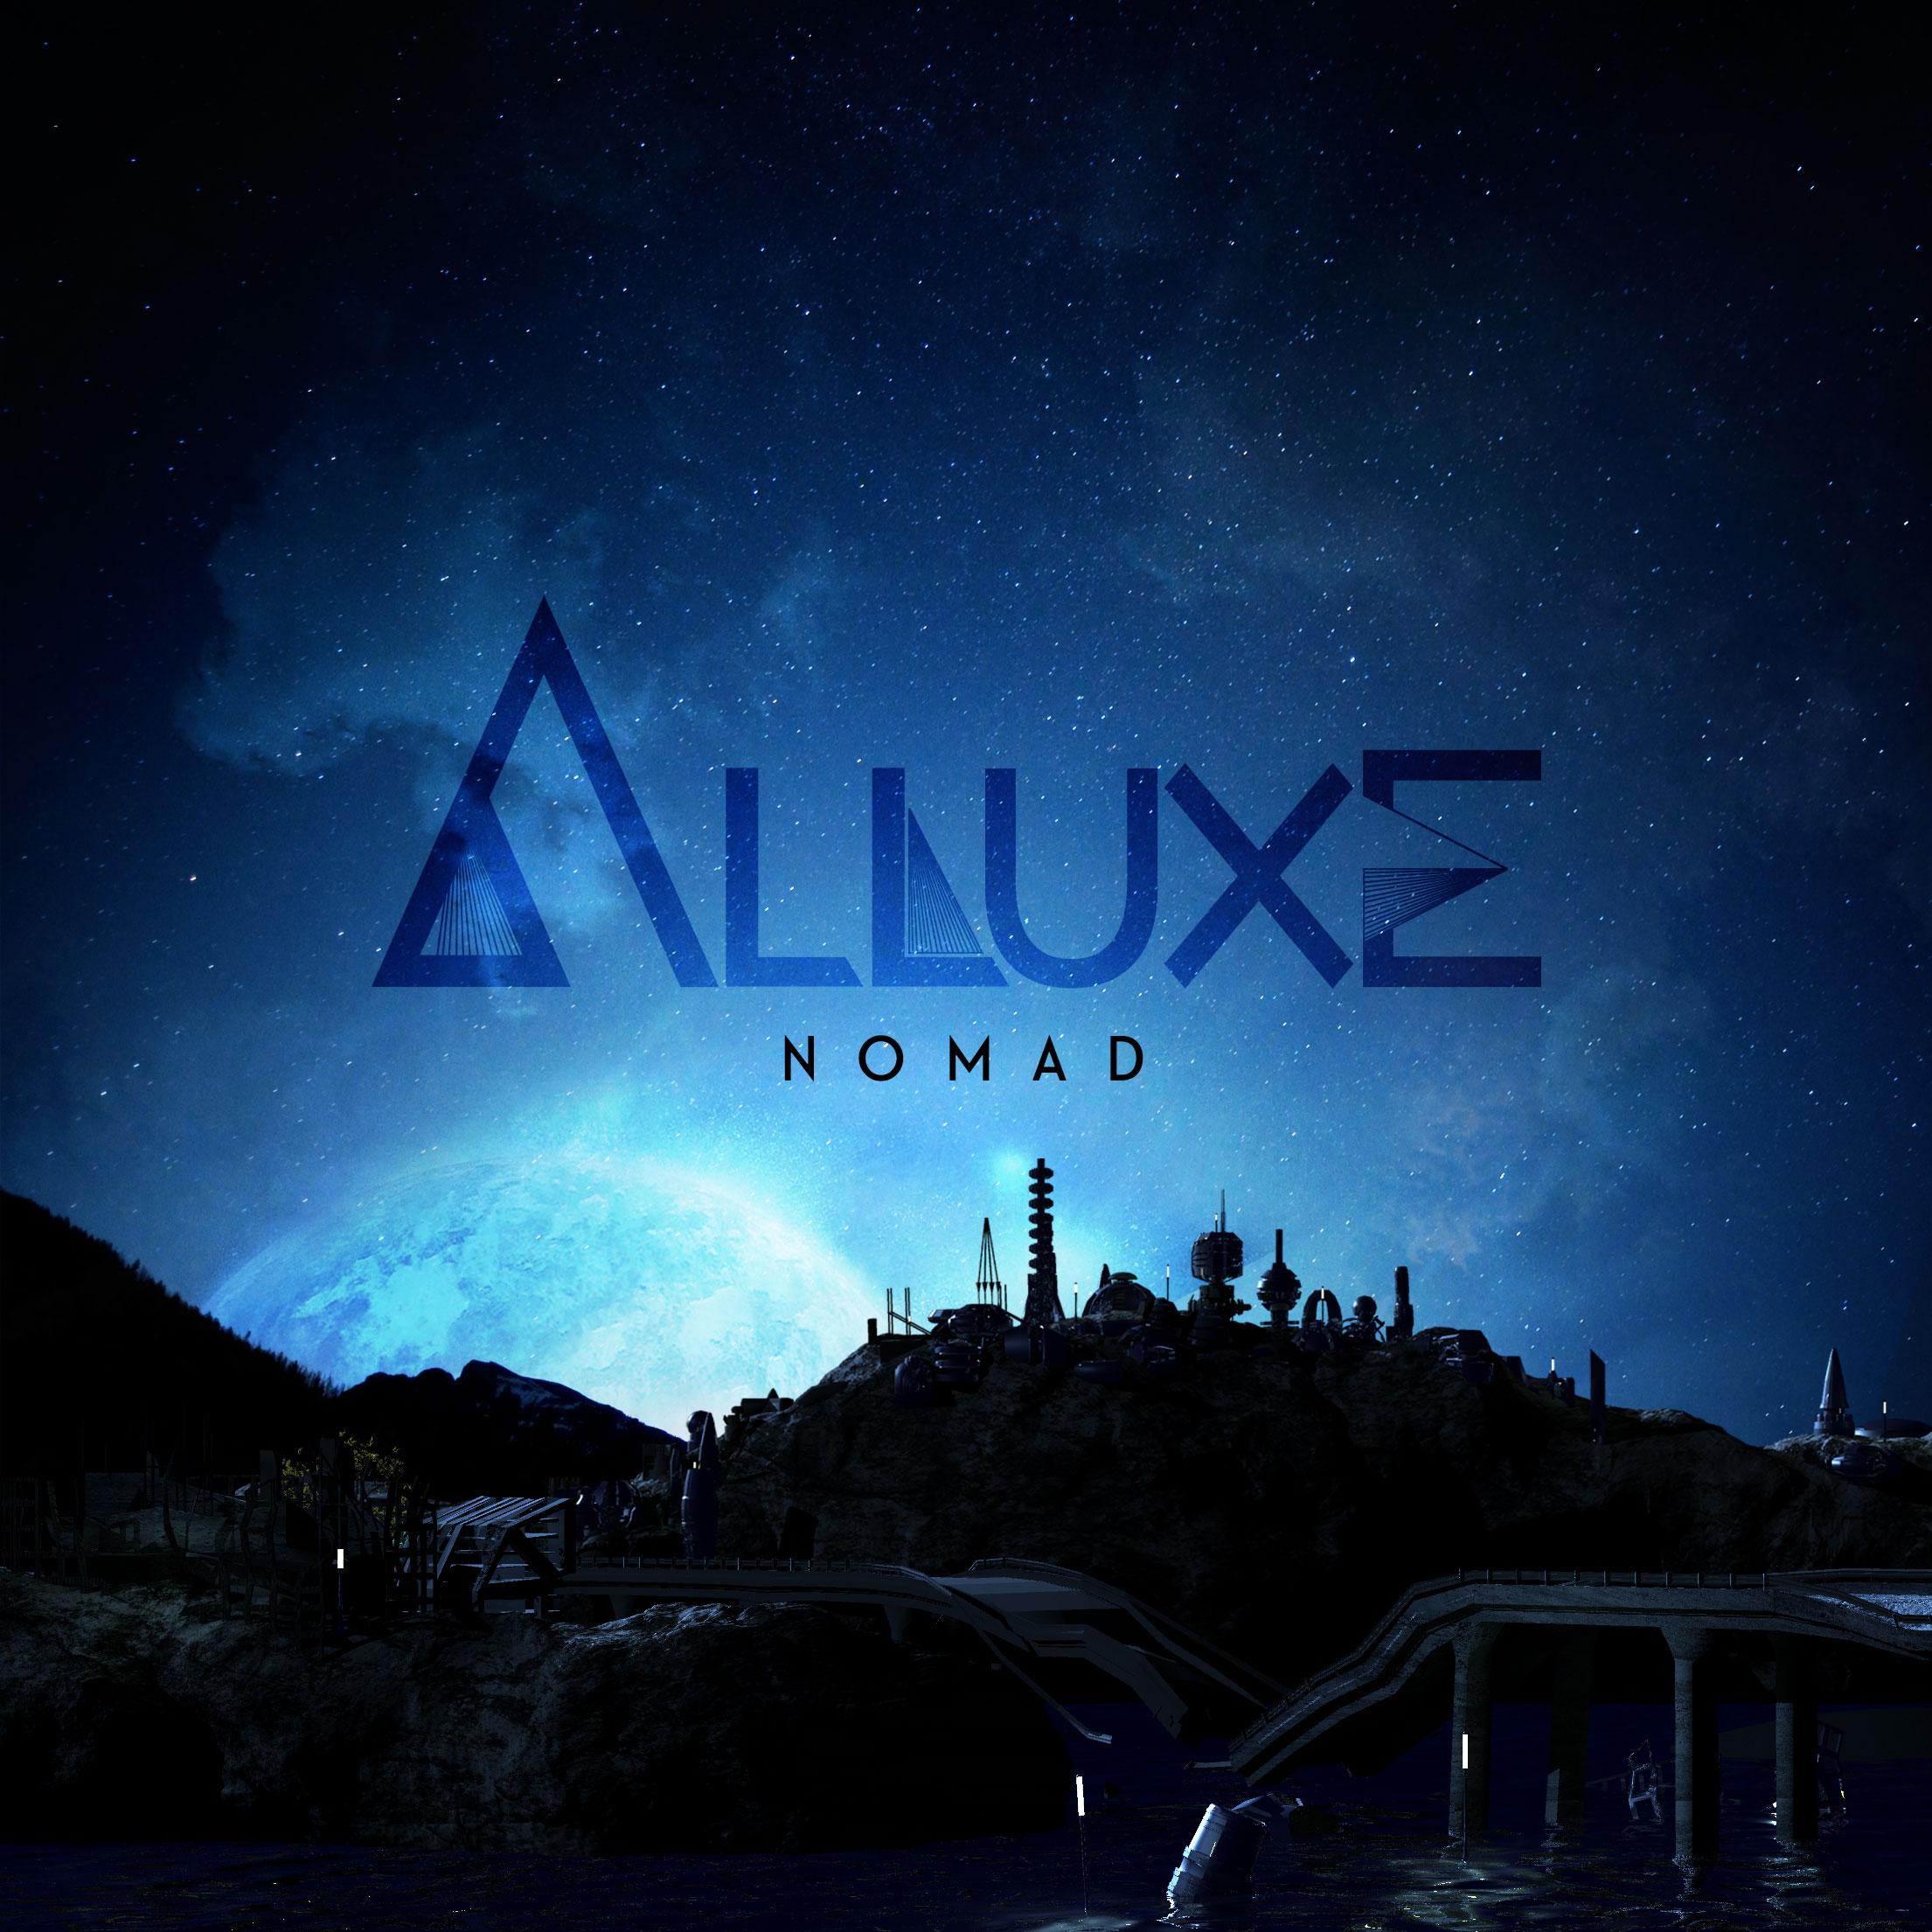 Alluxe-NOMAD-Artwork.jpg